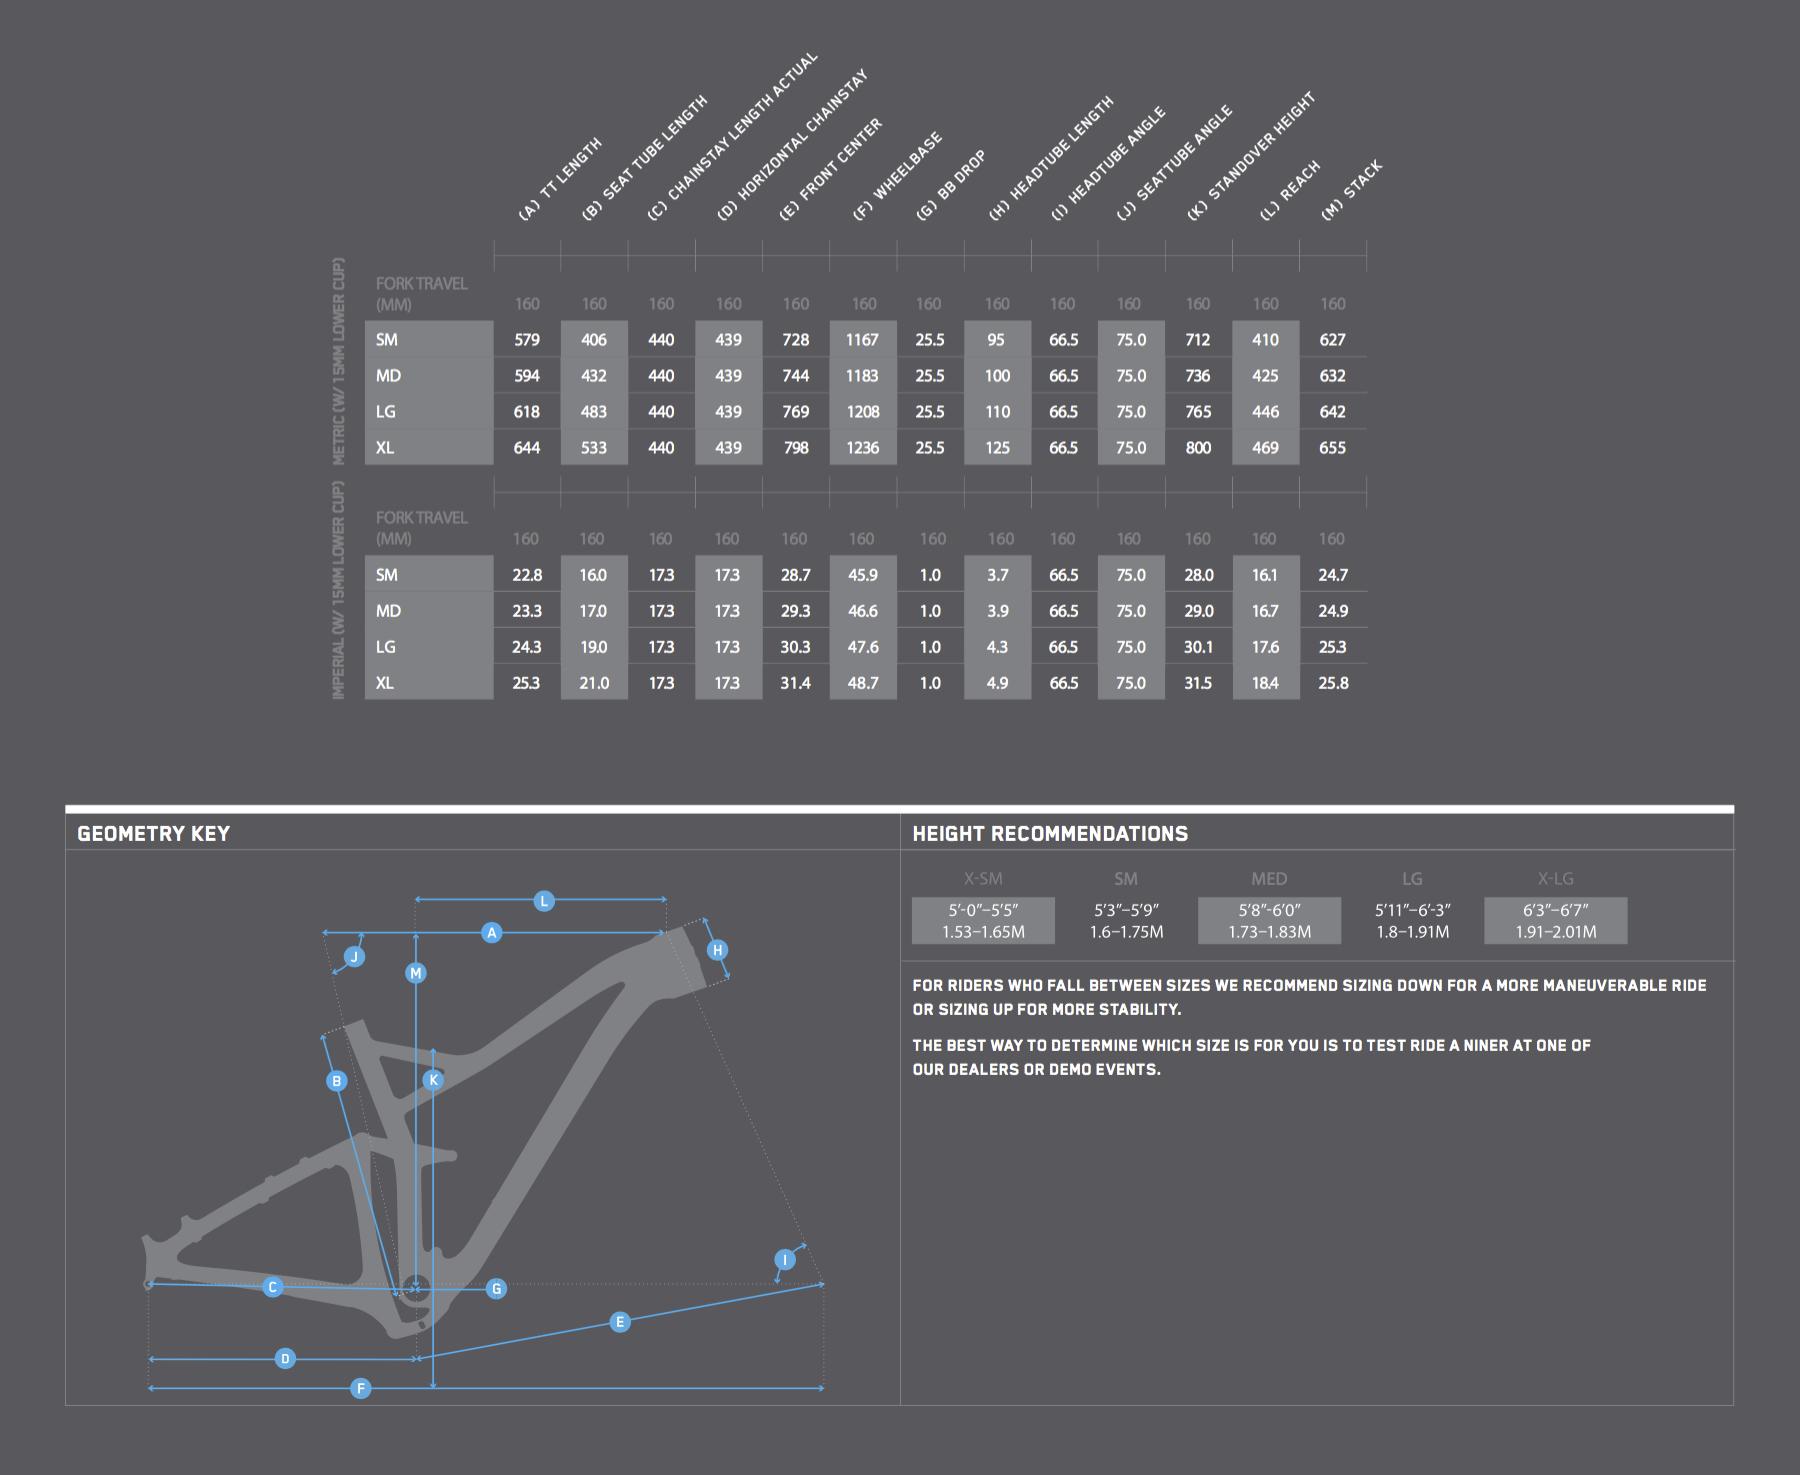 Niner RIP 9 RDO geometry chart